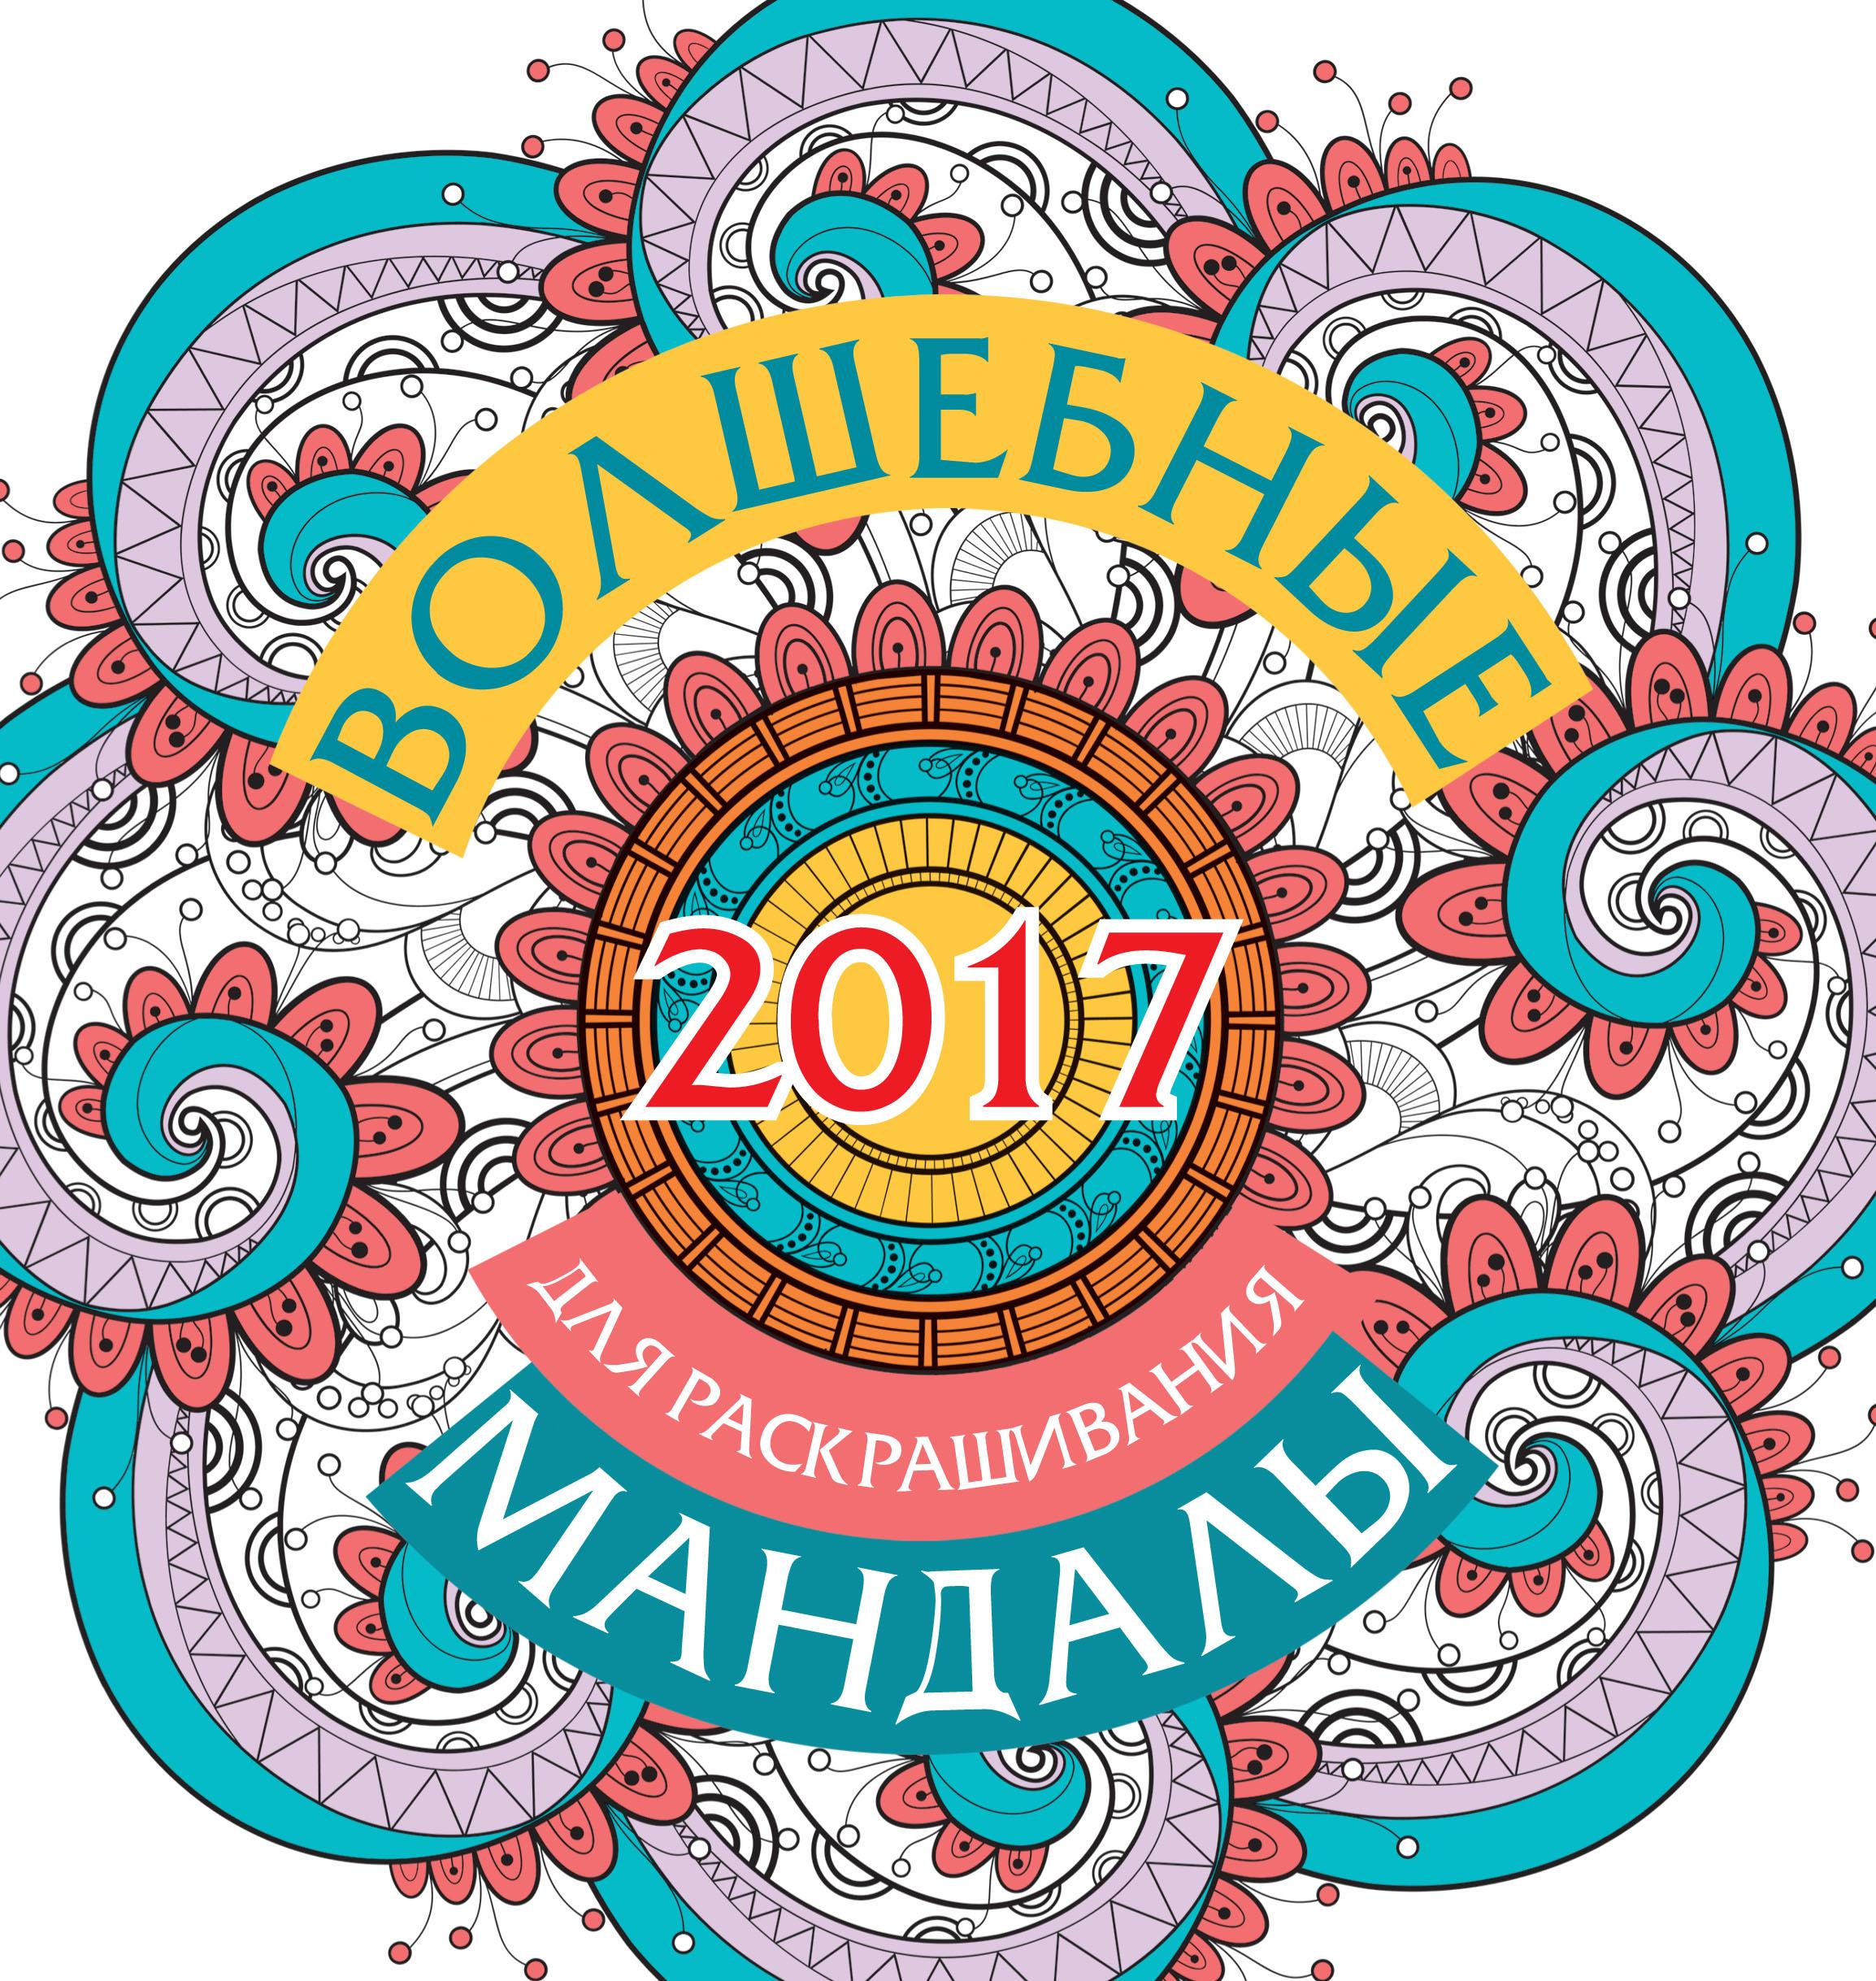 Волшебные мандалы для раскрашивания на 2017 год ( 978-5-17-098165-6 )